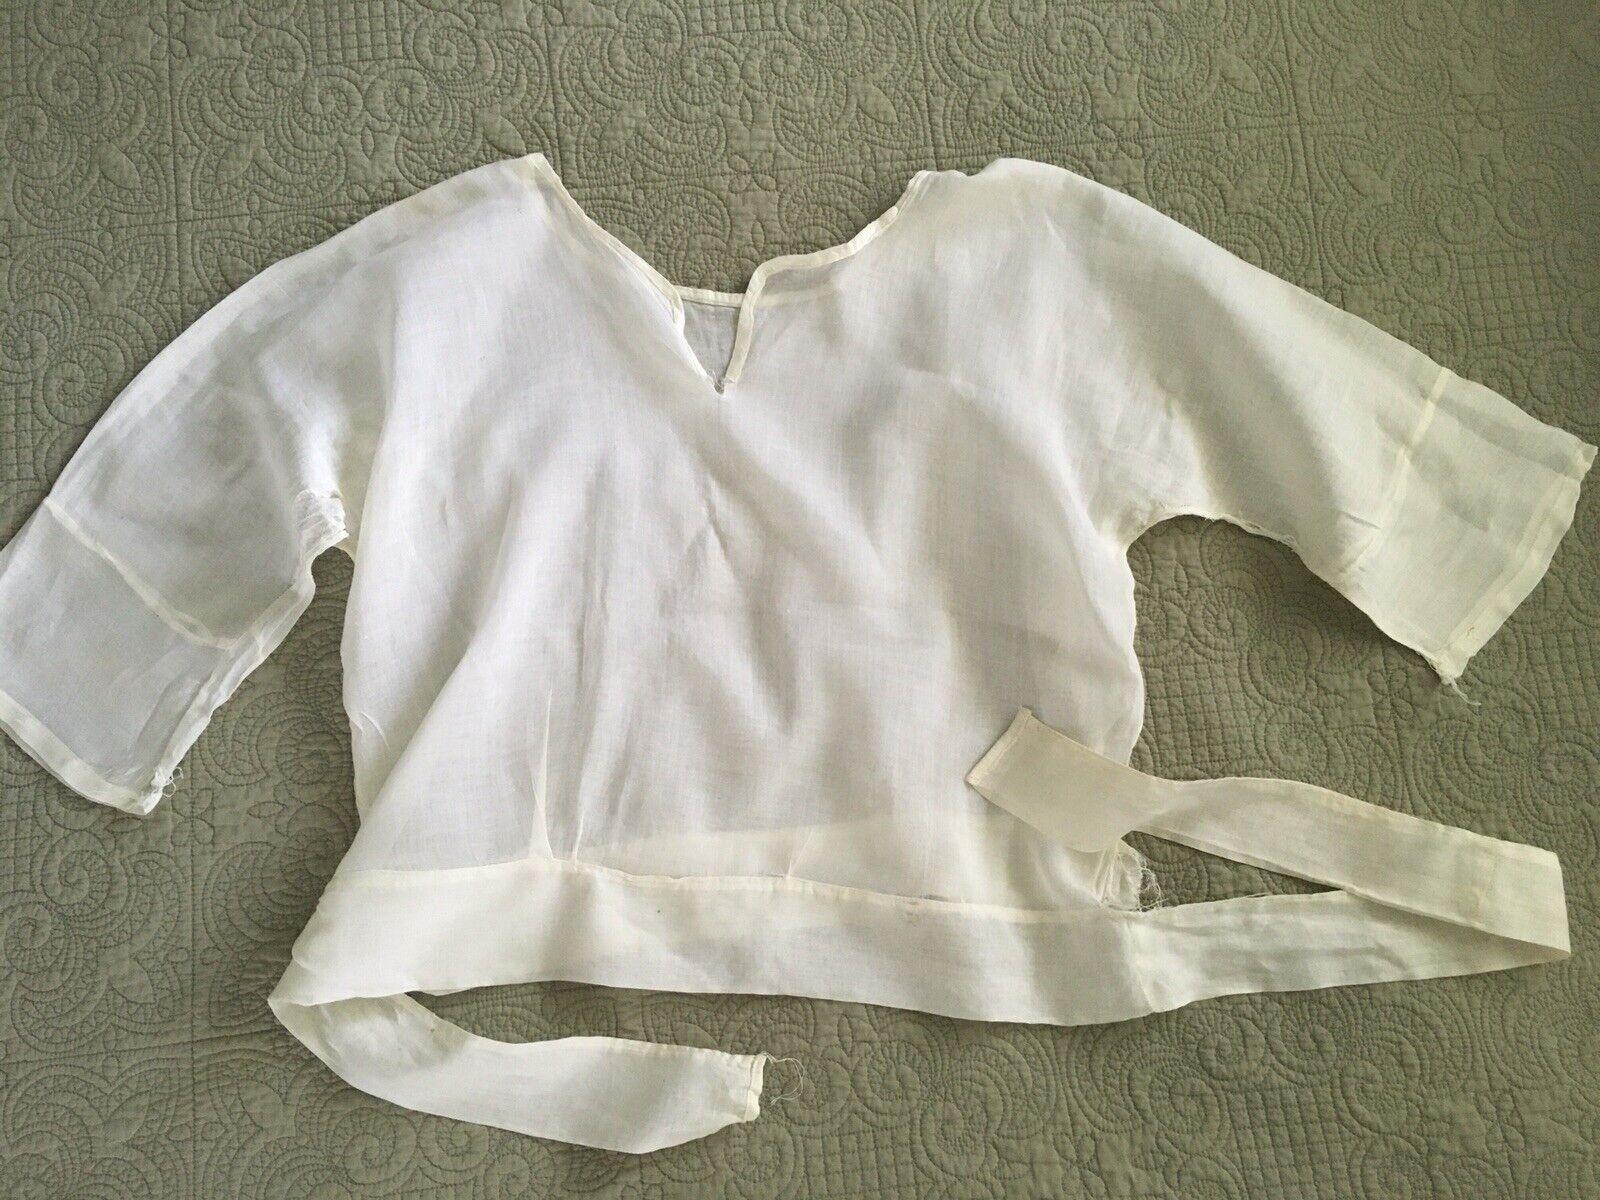 Antique Edwardian Victorian Shirtwaist Blouse - image 5